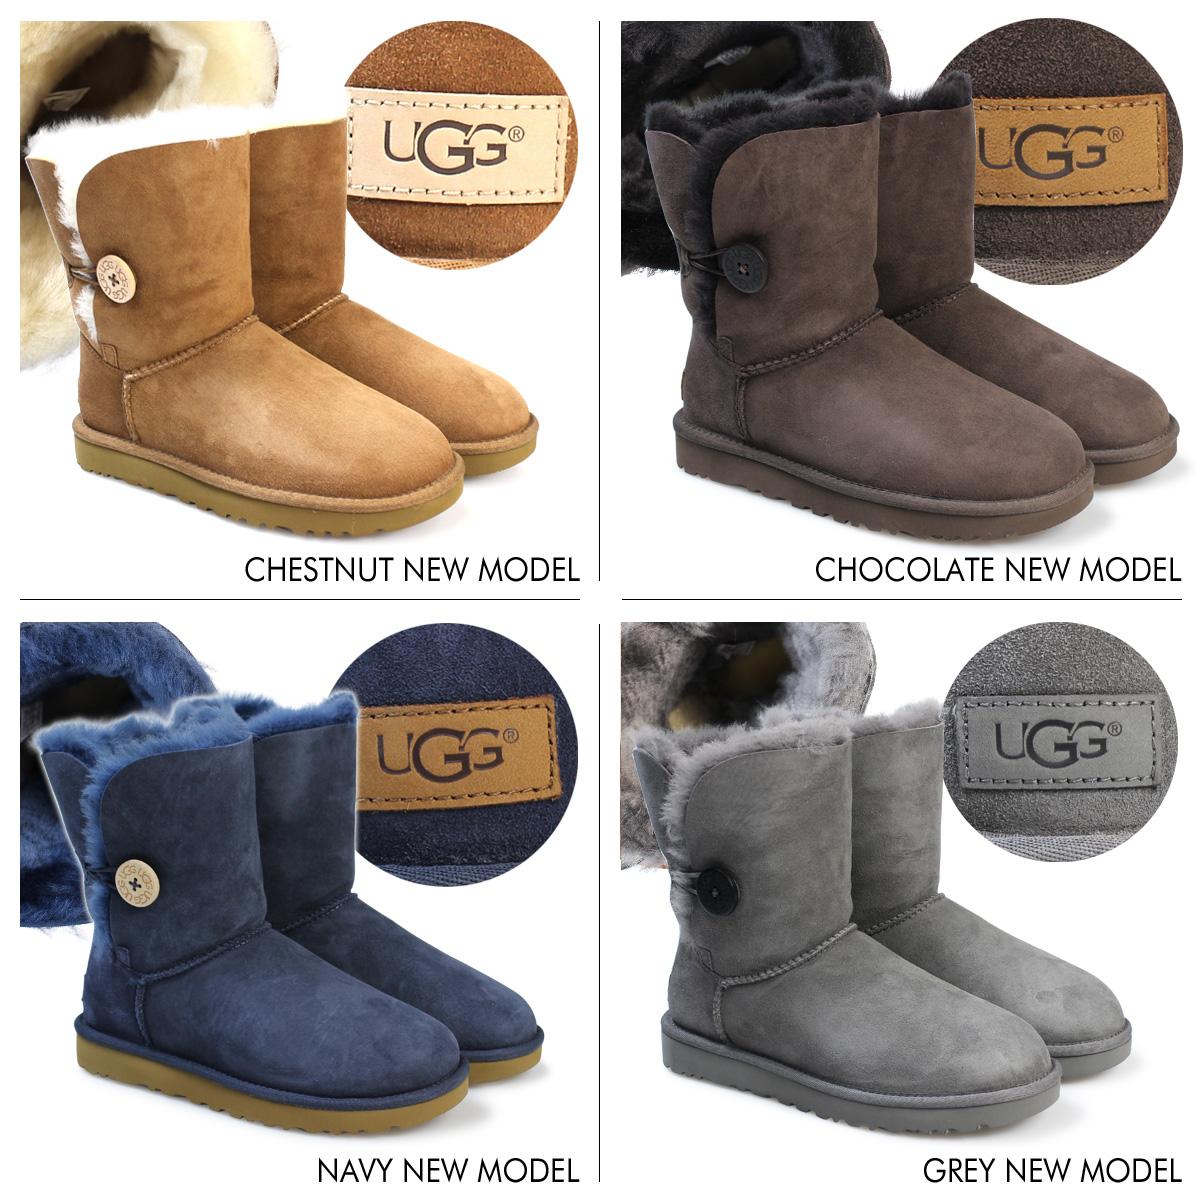 4e0185c70d7 Ugg Boots 5803 Factory | MIT Hillel